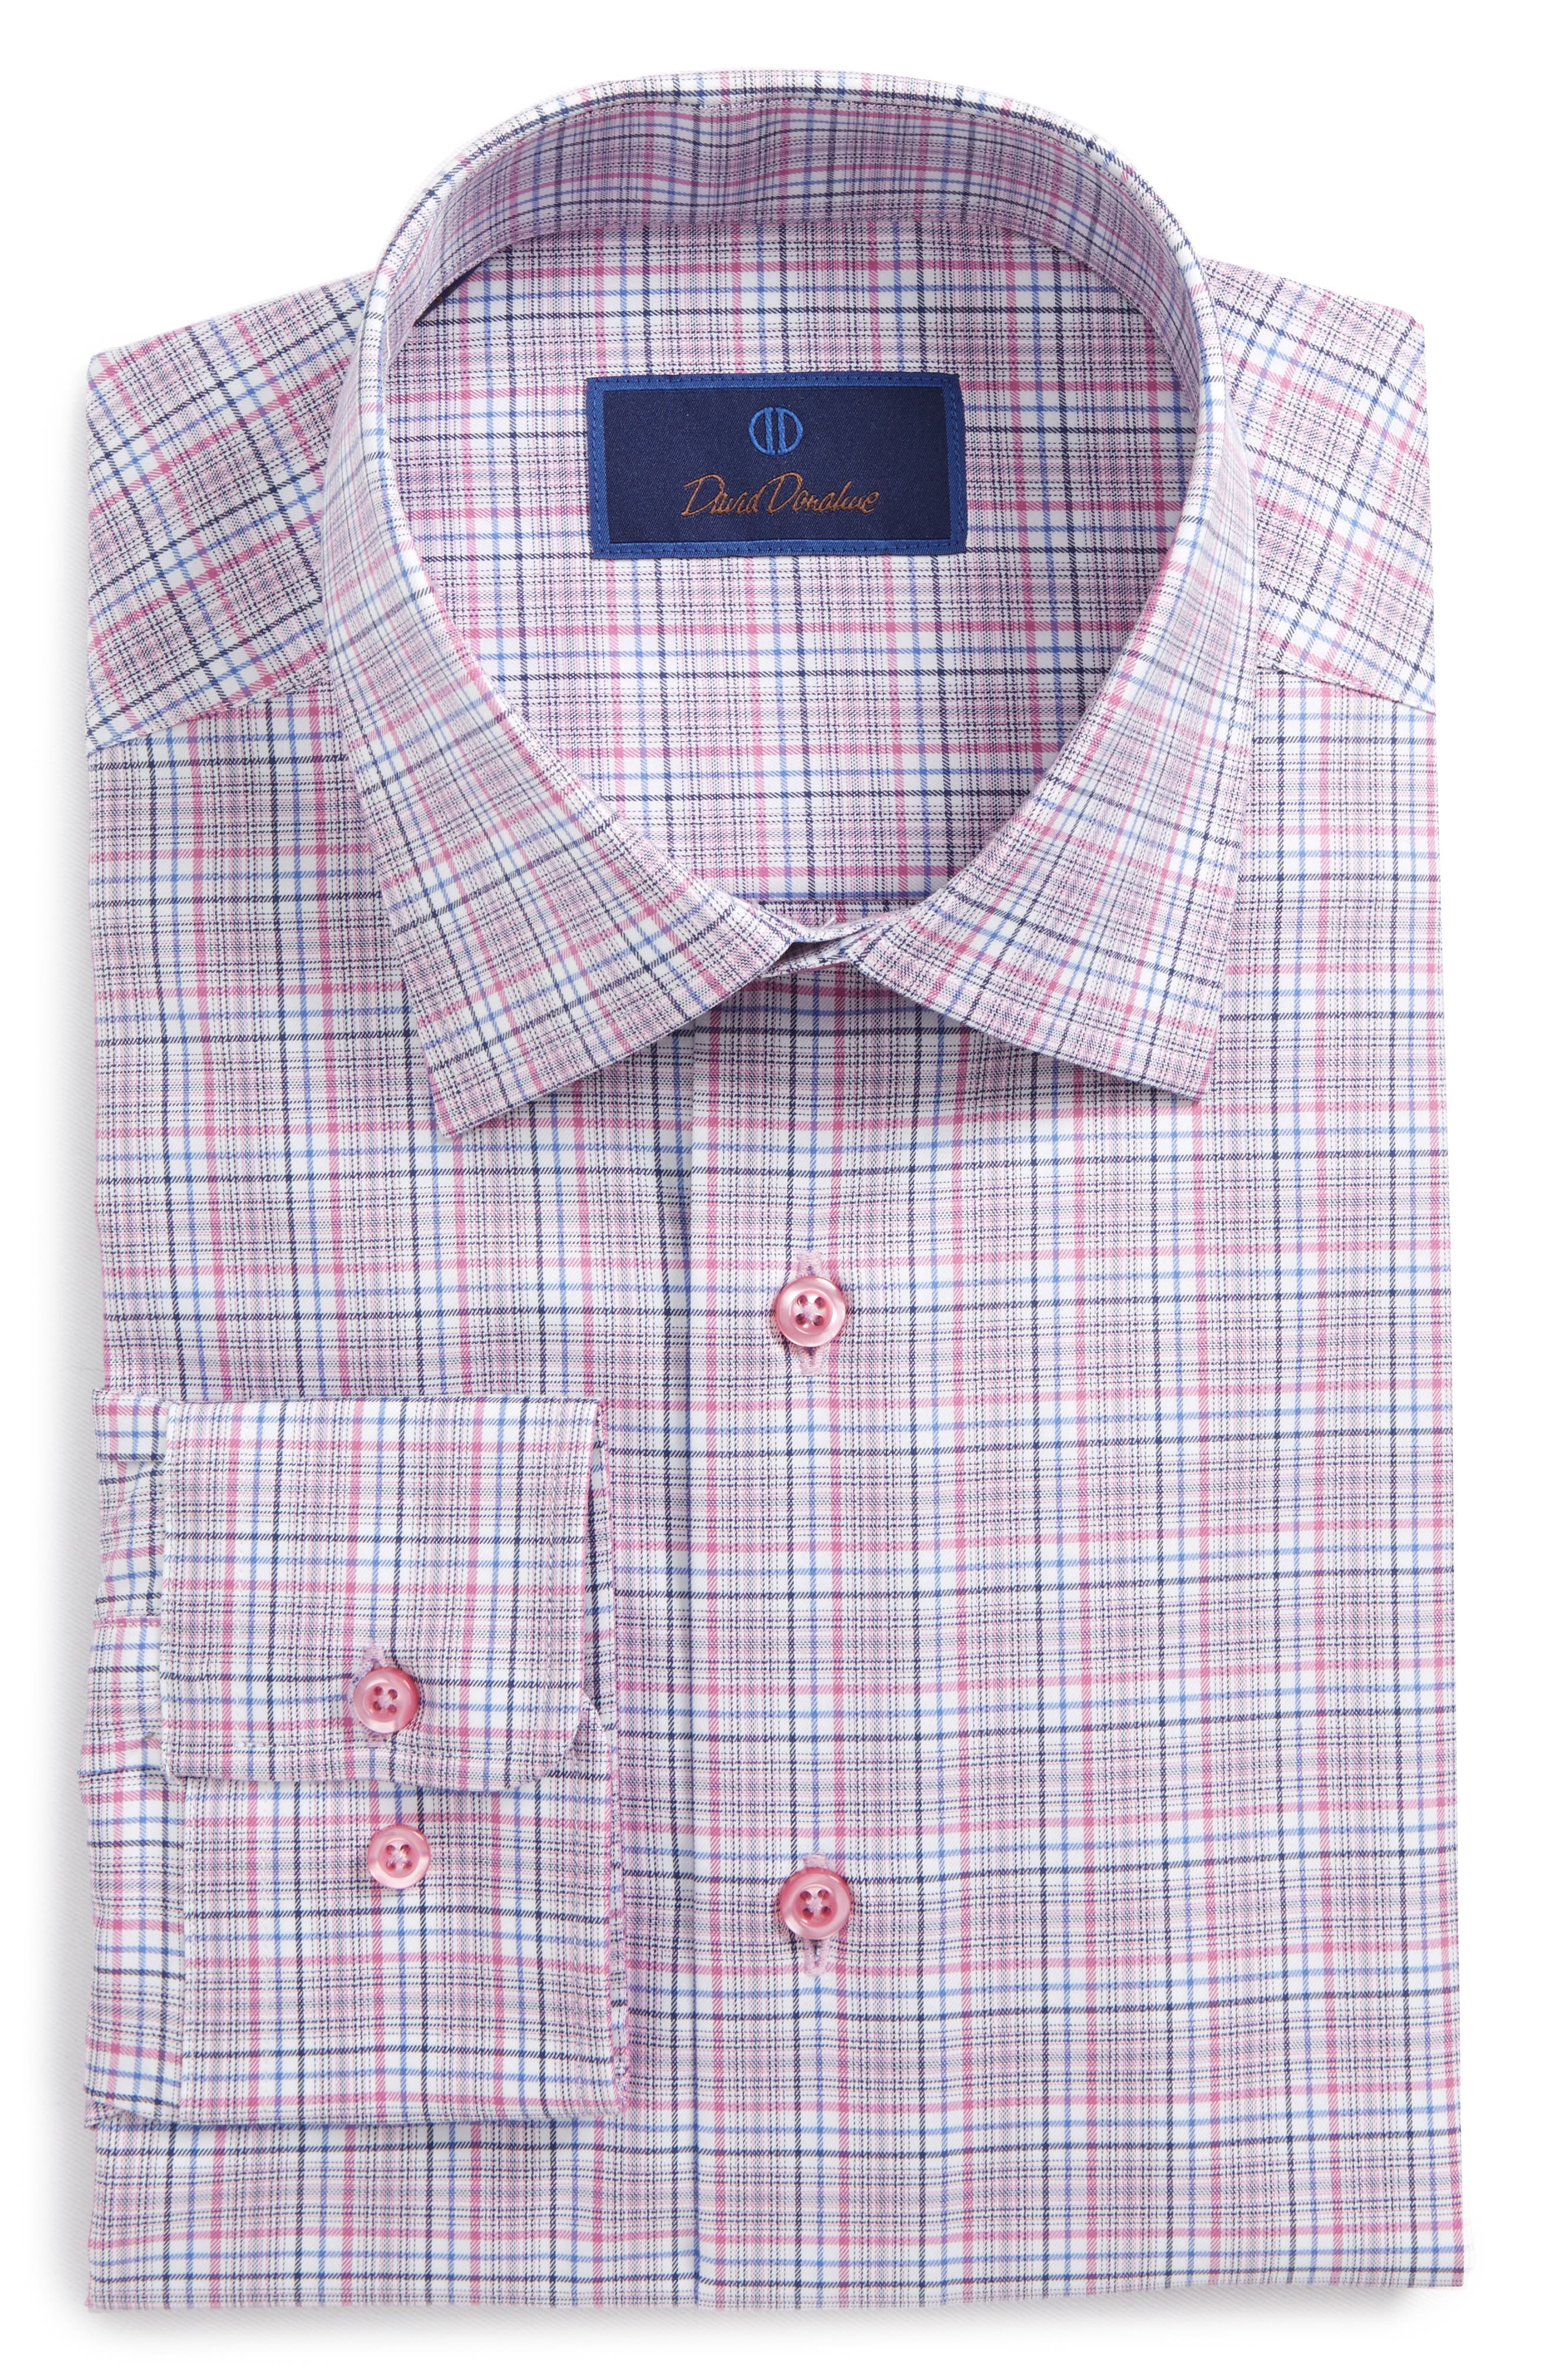 Regular Fit Plaid Dress Shirt,                         Main,                         color, 652